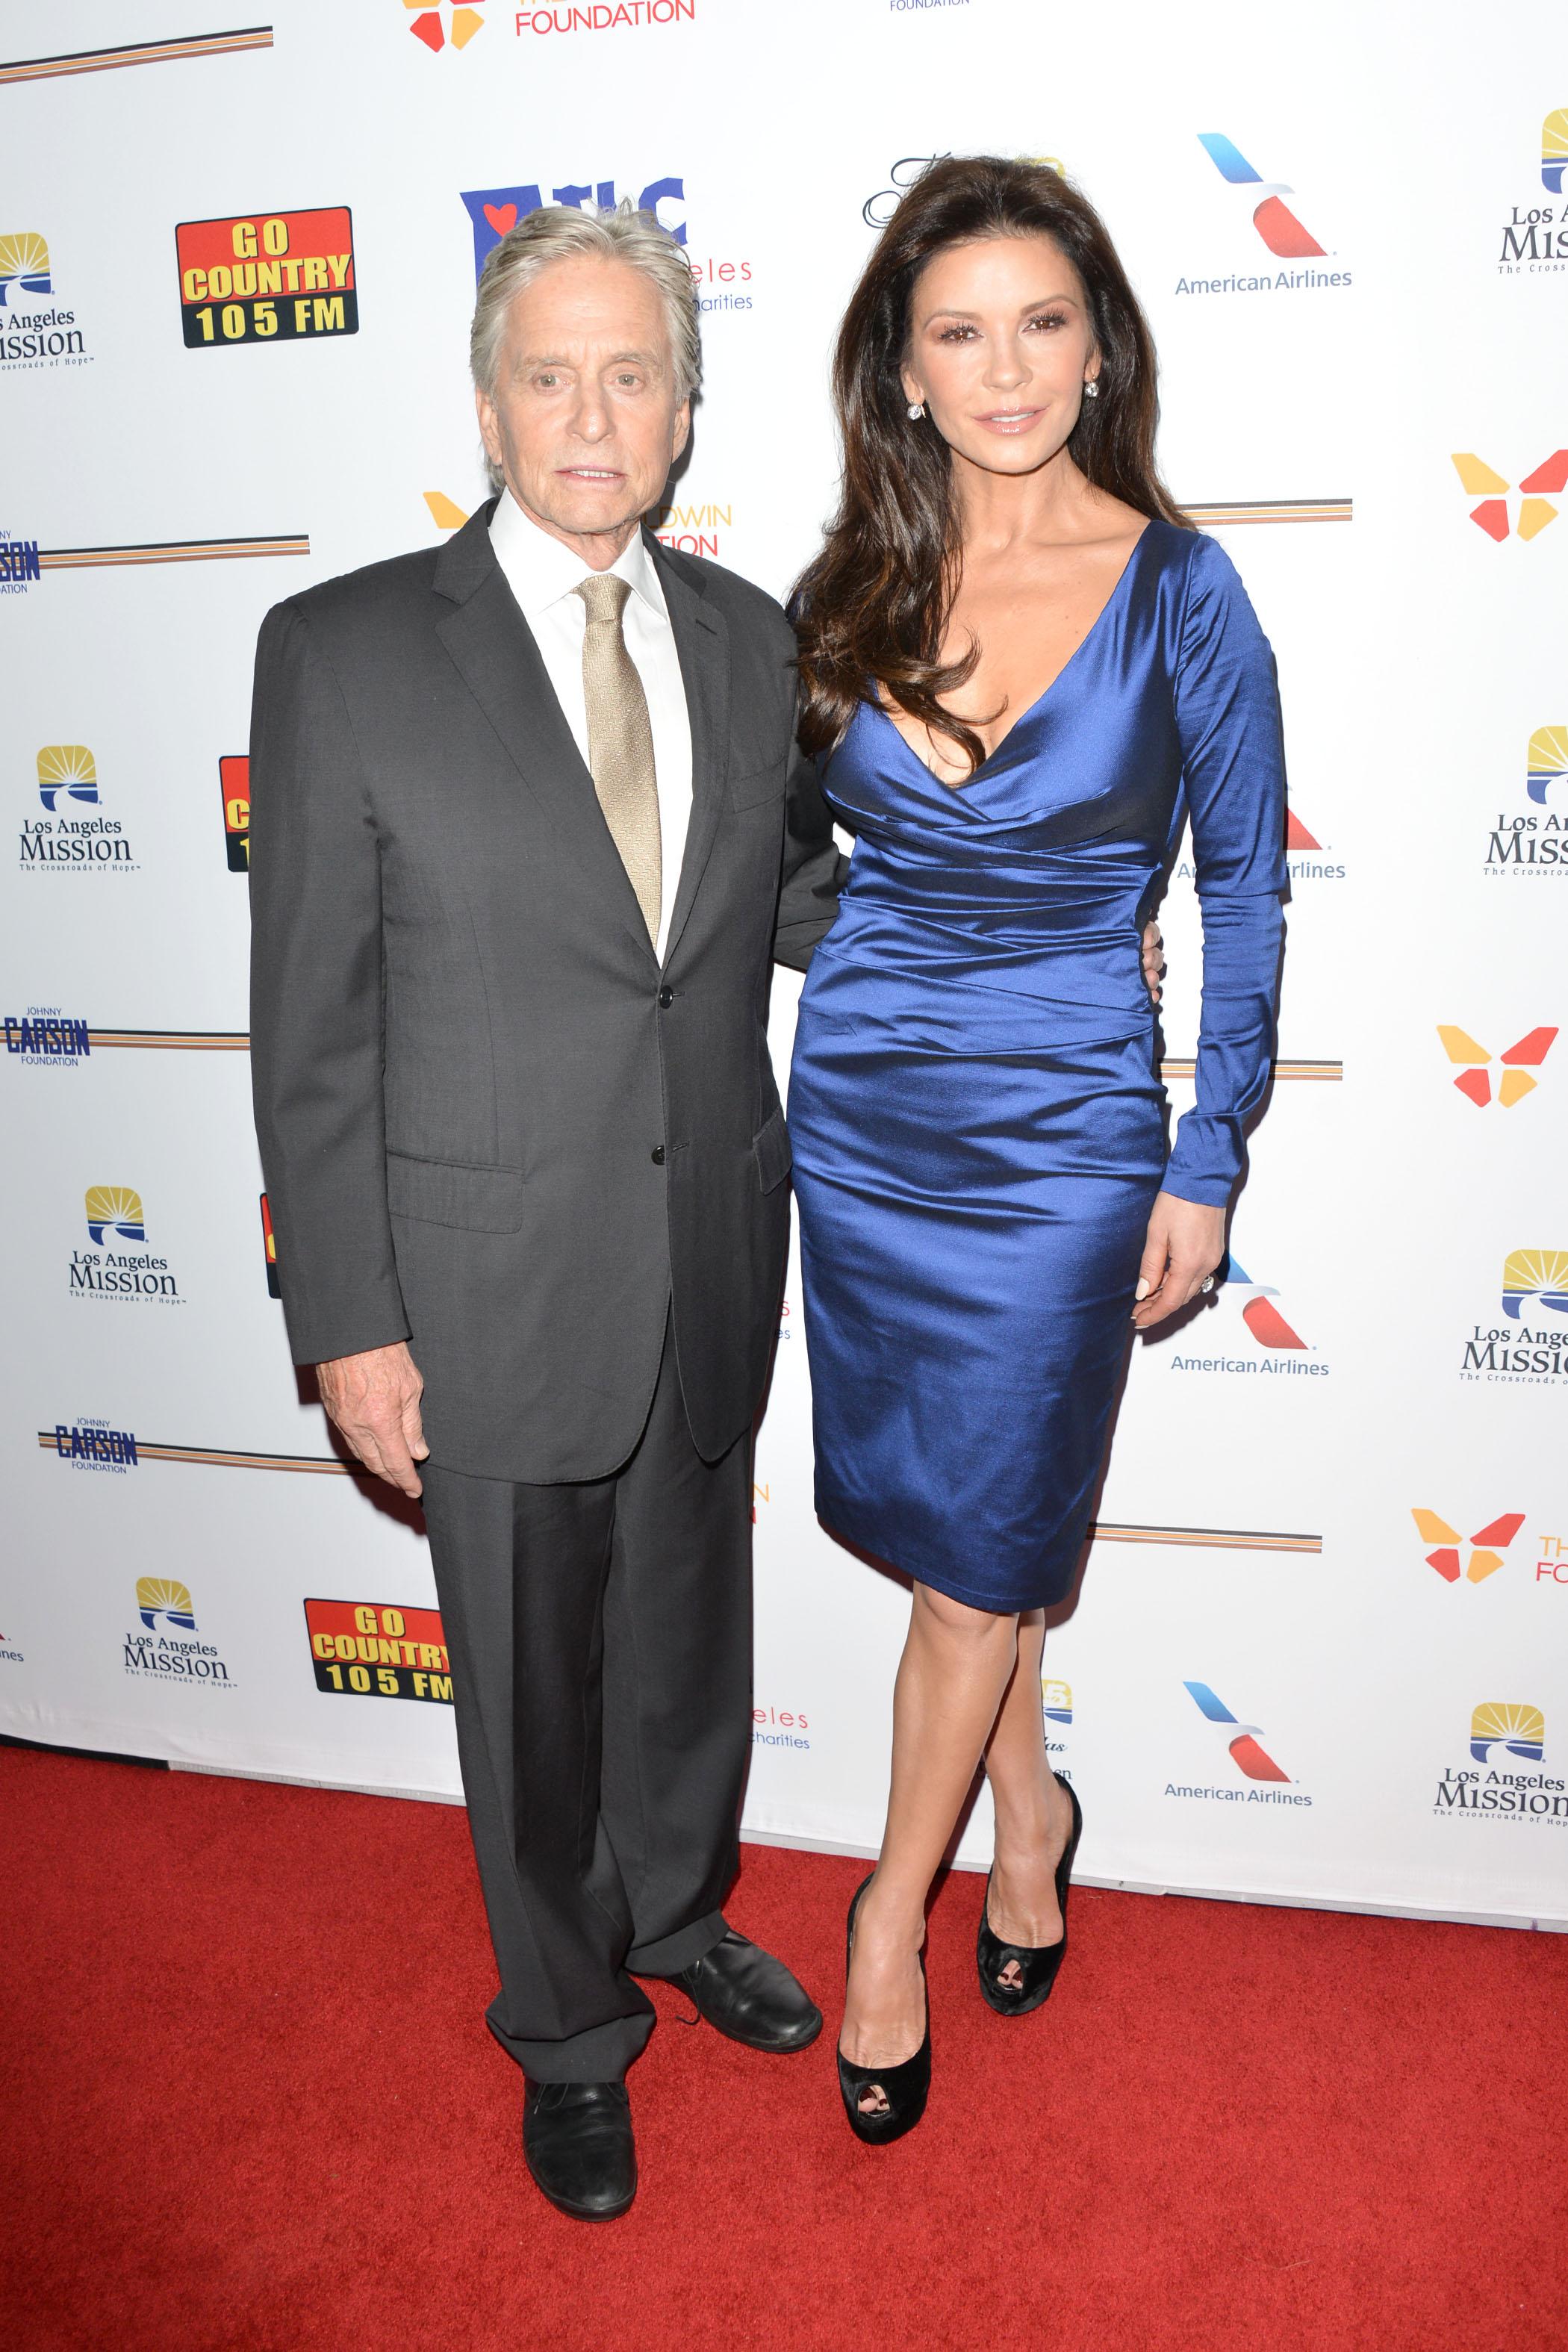 7th Annual Legacy of Vision Gala <P> Pictured: Michael Douglas and Catherine Zeta-Jones <B>Ref: SPL1618444  091117  </B><BR/> Picture by: Tony DiMaio / Splash News<BR/> </P><P> <B>Splash News and Pictures</B><BR/> Los Angeles:310-821-2666<BR/> New York:212-619-2666<BR/> London:870-934-2666<BR/> <span id=